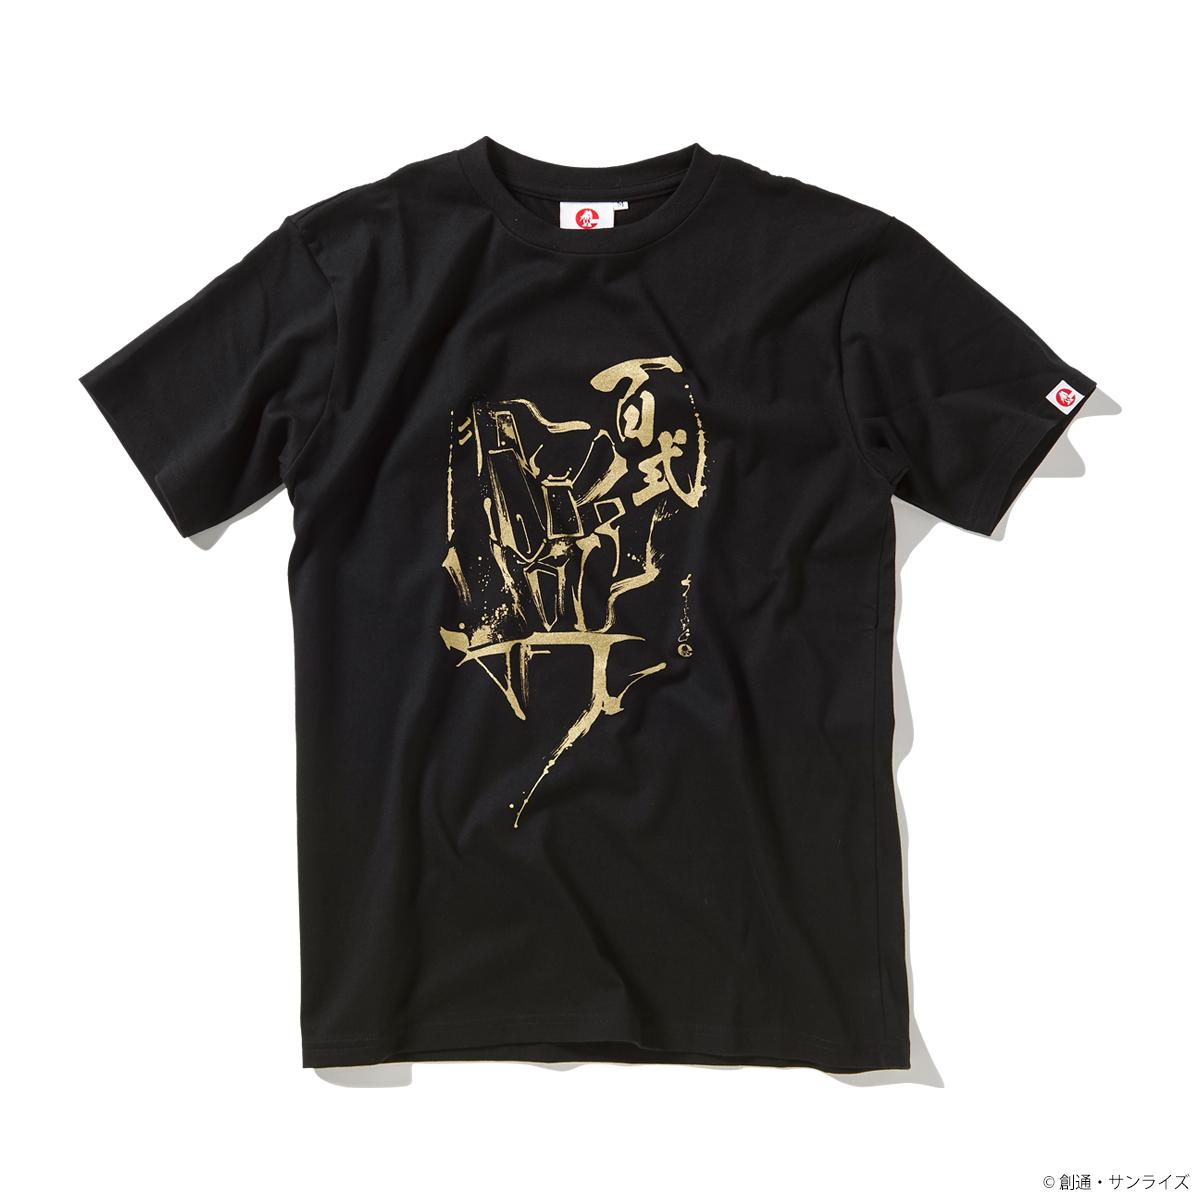 STRICT-G JAPAN 『機動戦士Zガンダム』Tシャツ 百式筆絵